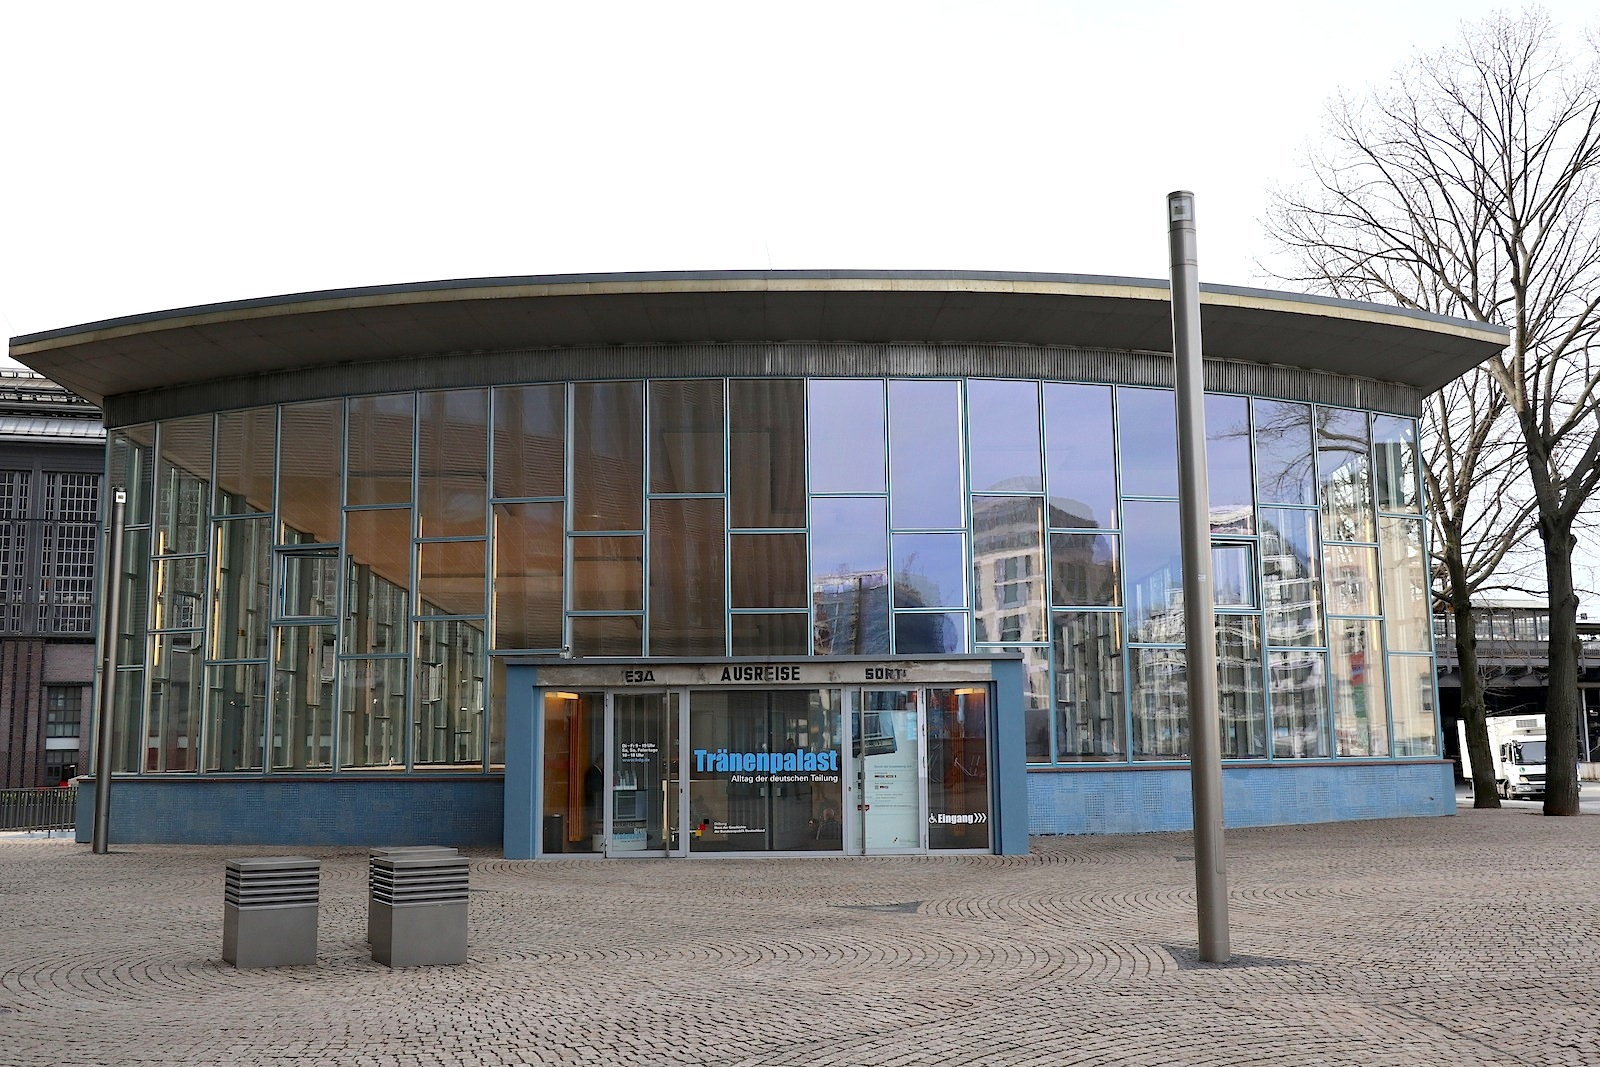 Tränenpalast. Entwurf Horst Lüderitz, Fertigstellung: 1962